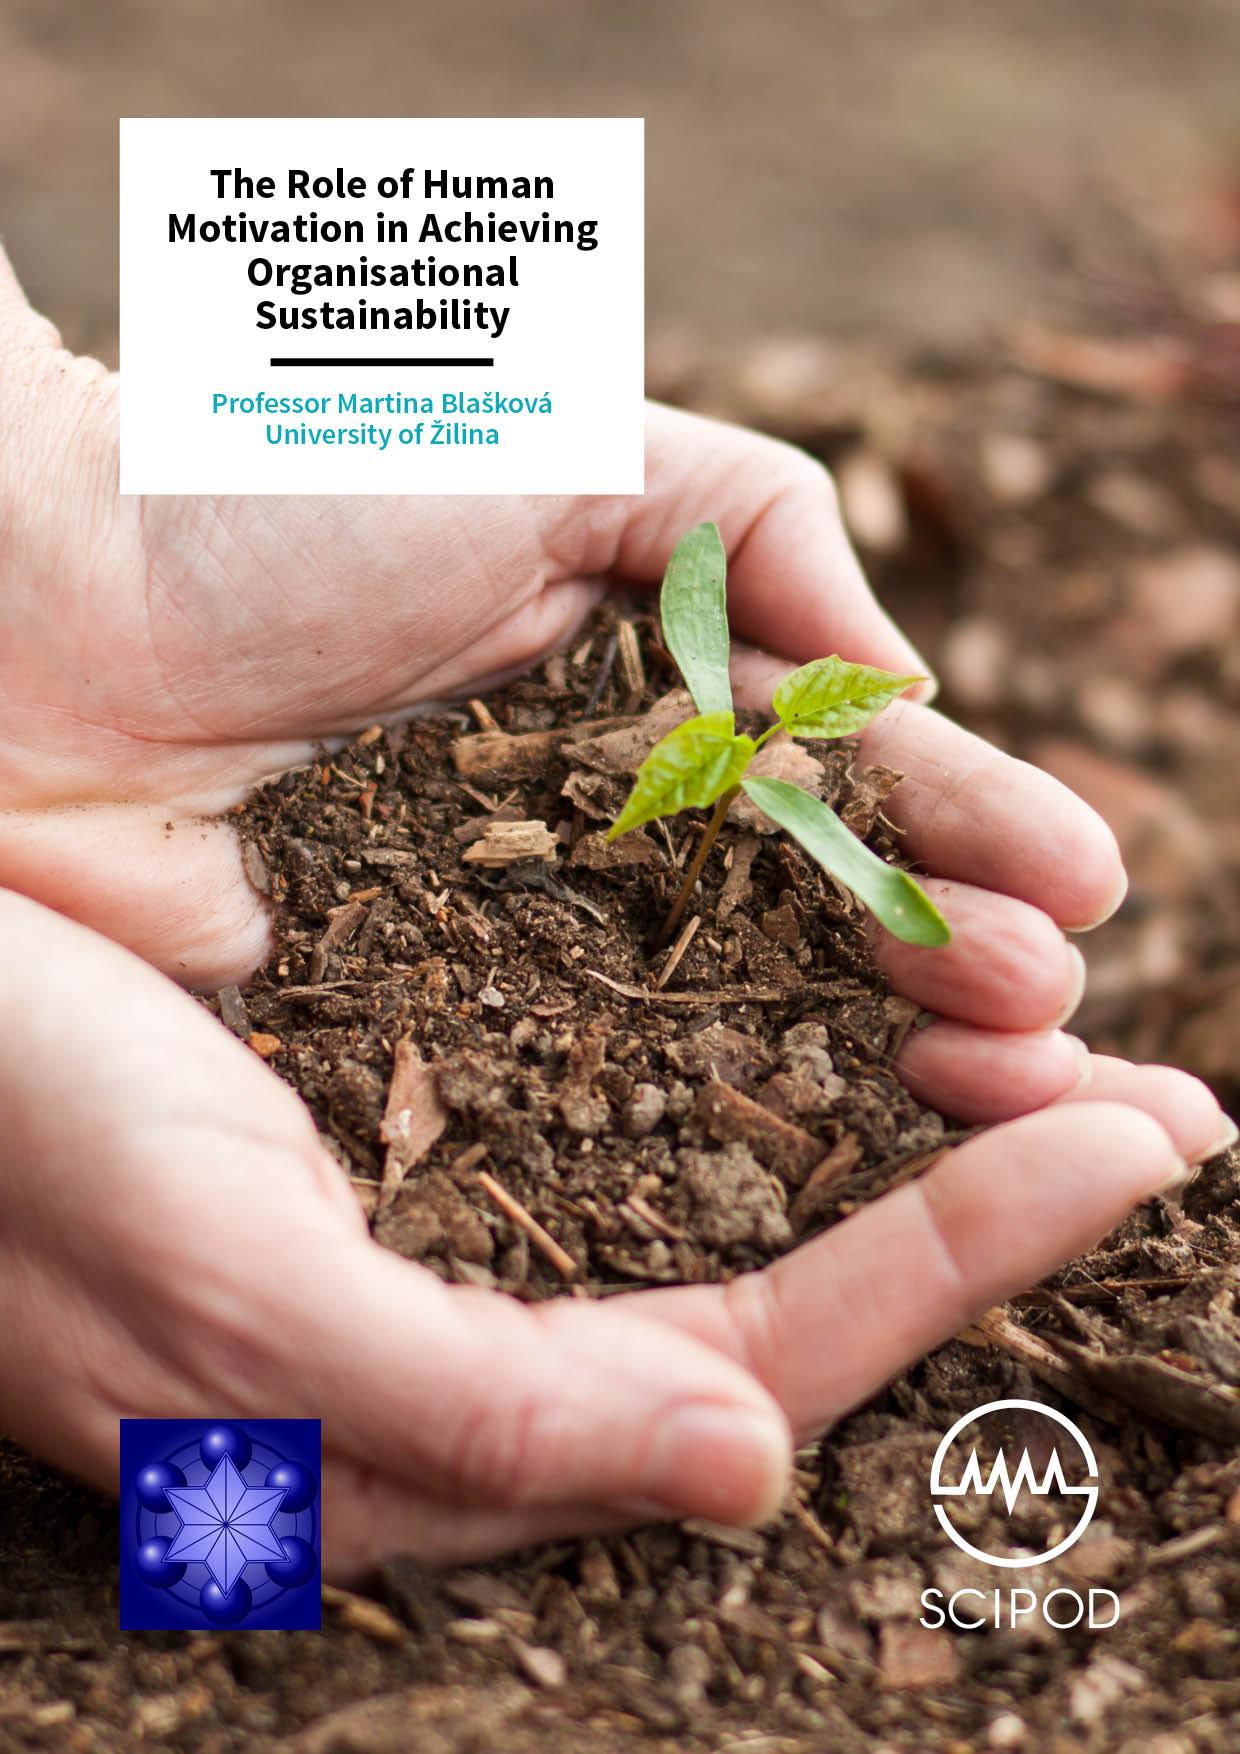 The Role of Human Motivation in Achieving Organisational Sustainability – Professor Martina Blašková, University of Žilina